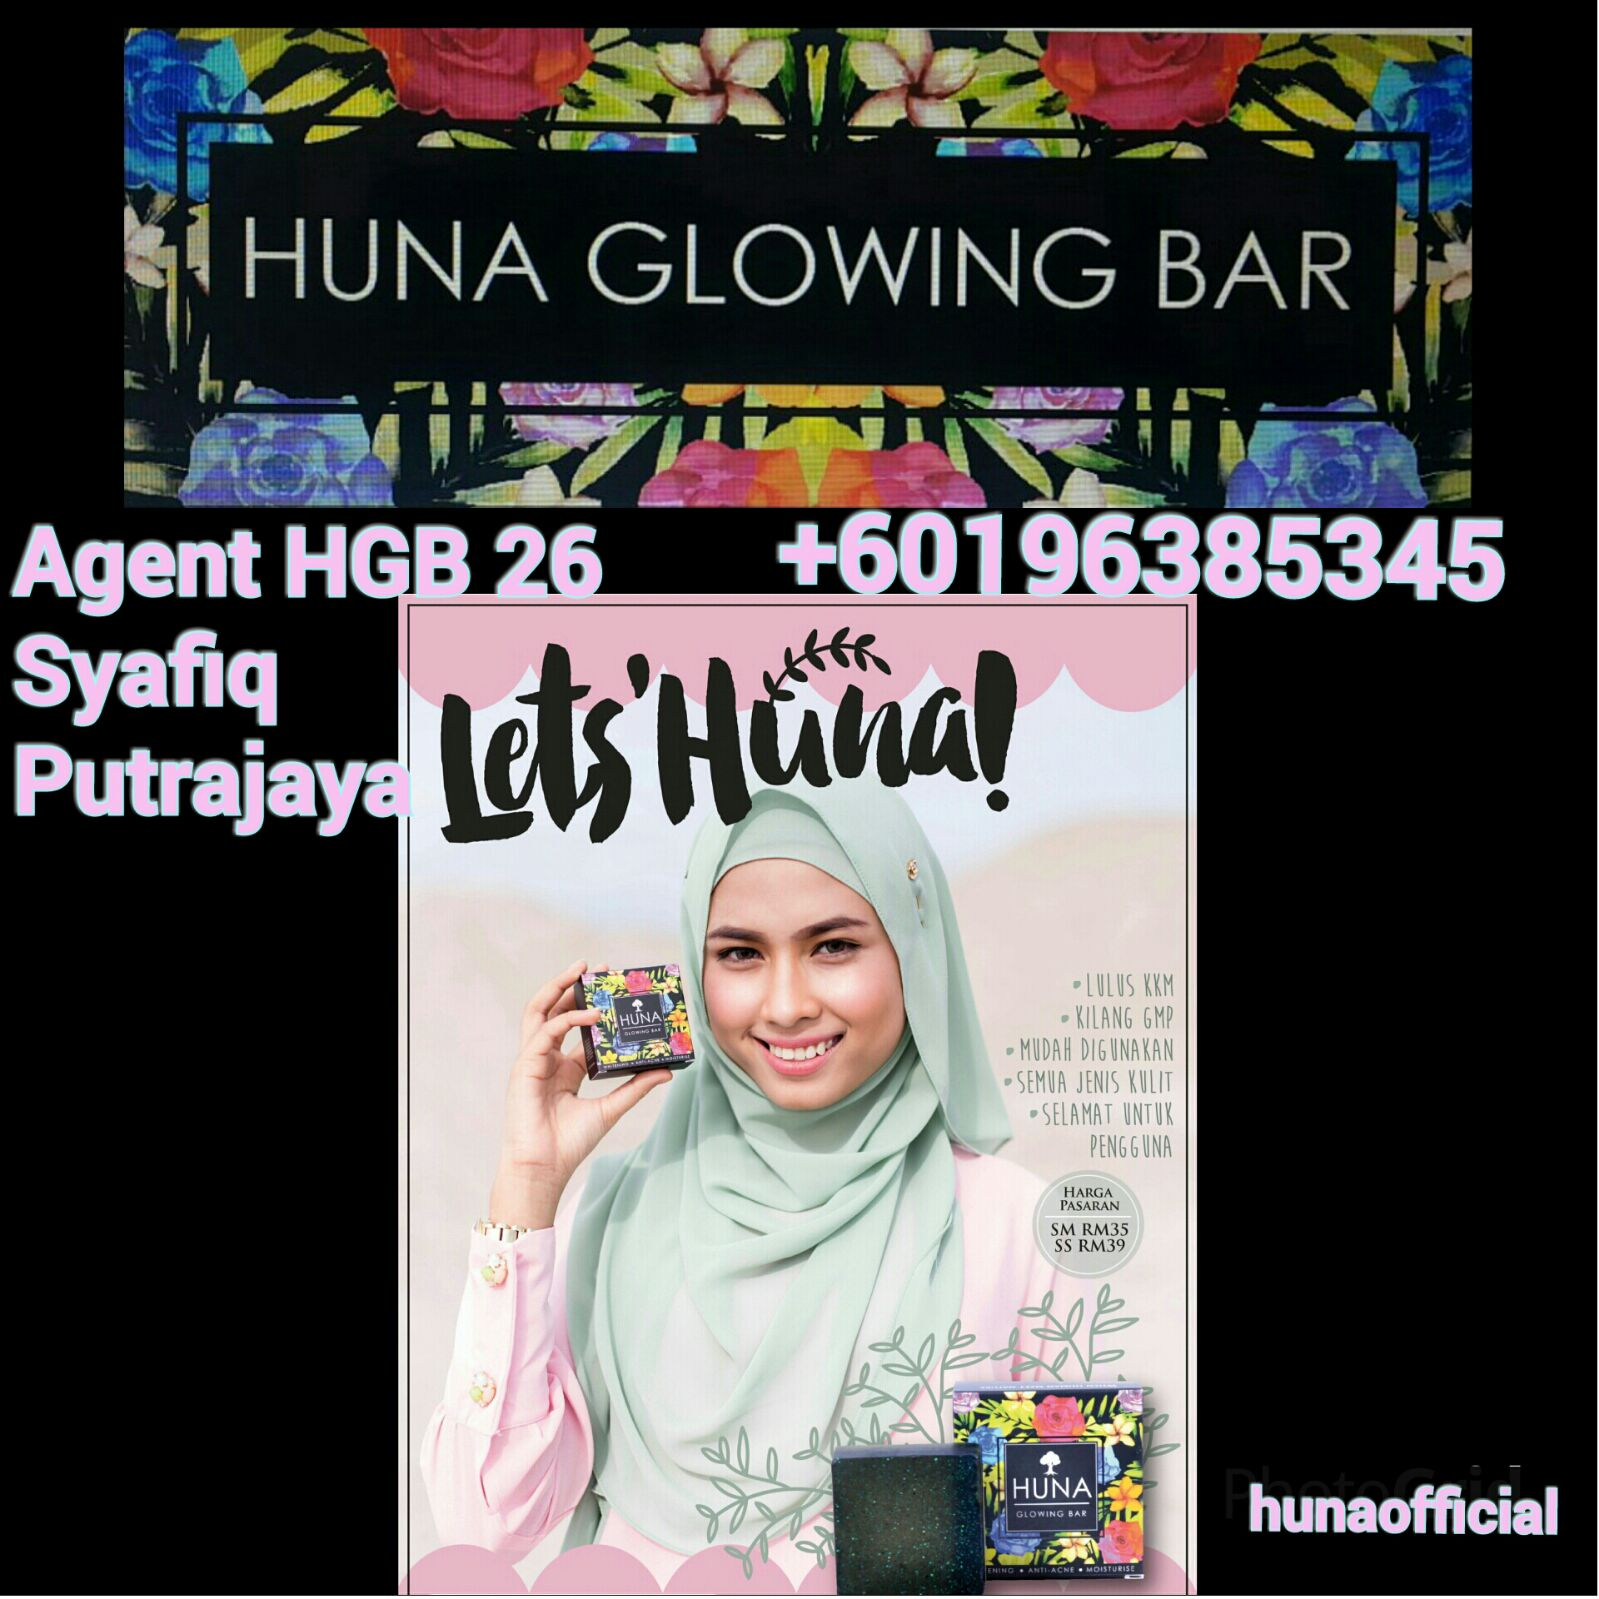 Huna Glowing Bar (Menyelesaikan Masalah Kulit Muka)